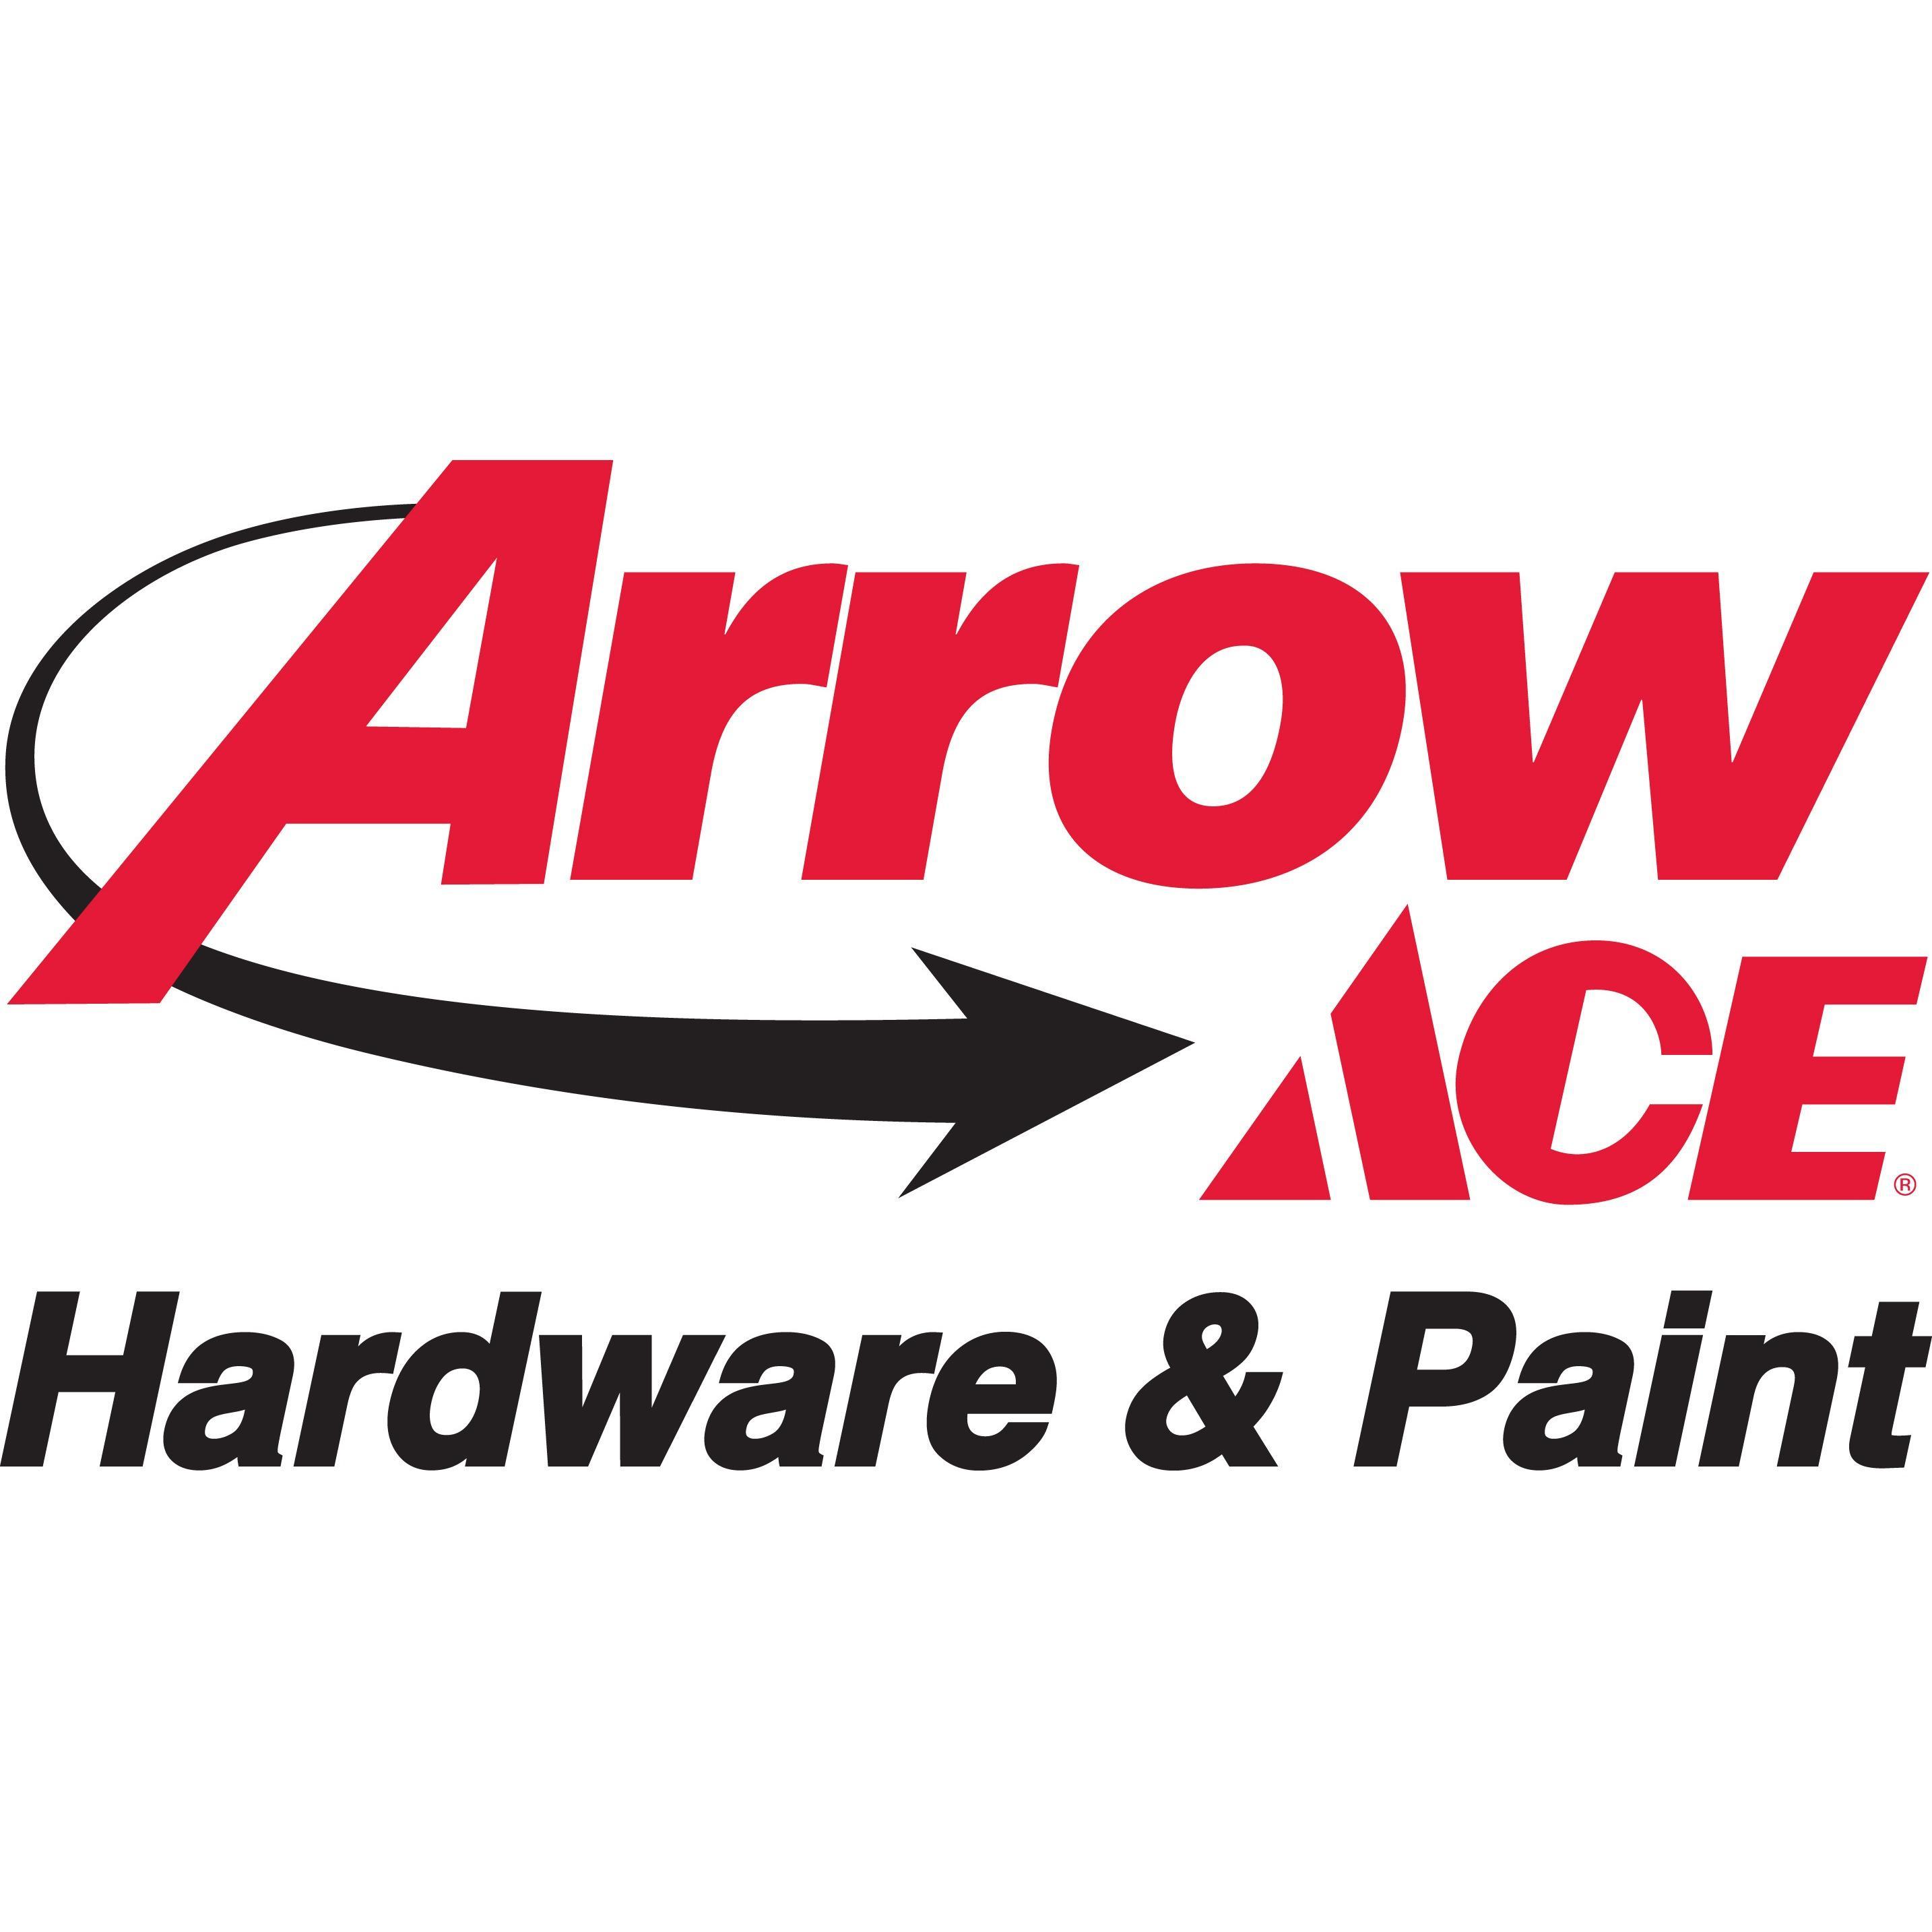 Arrow Ace Hardware & Paint